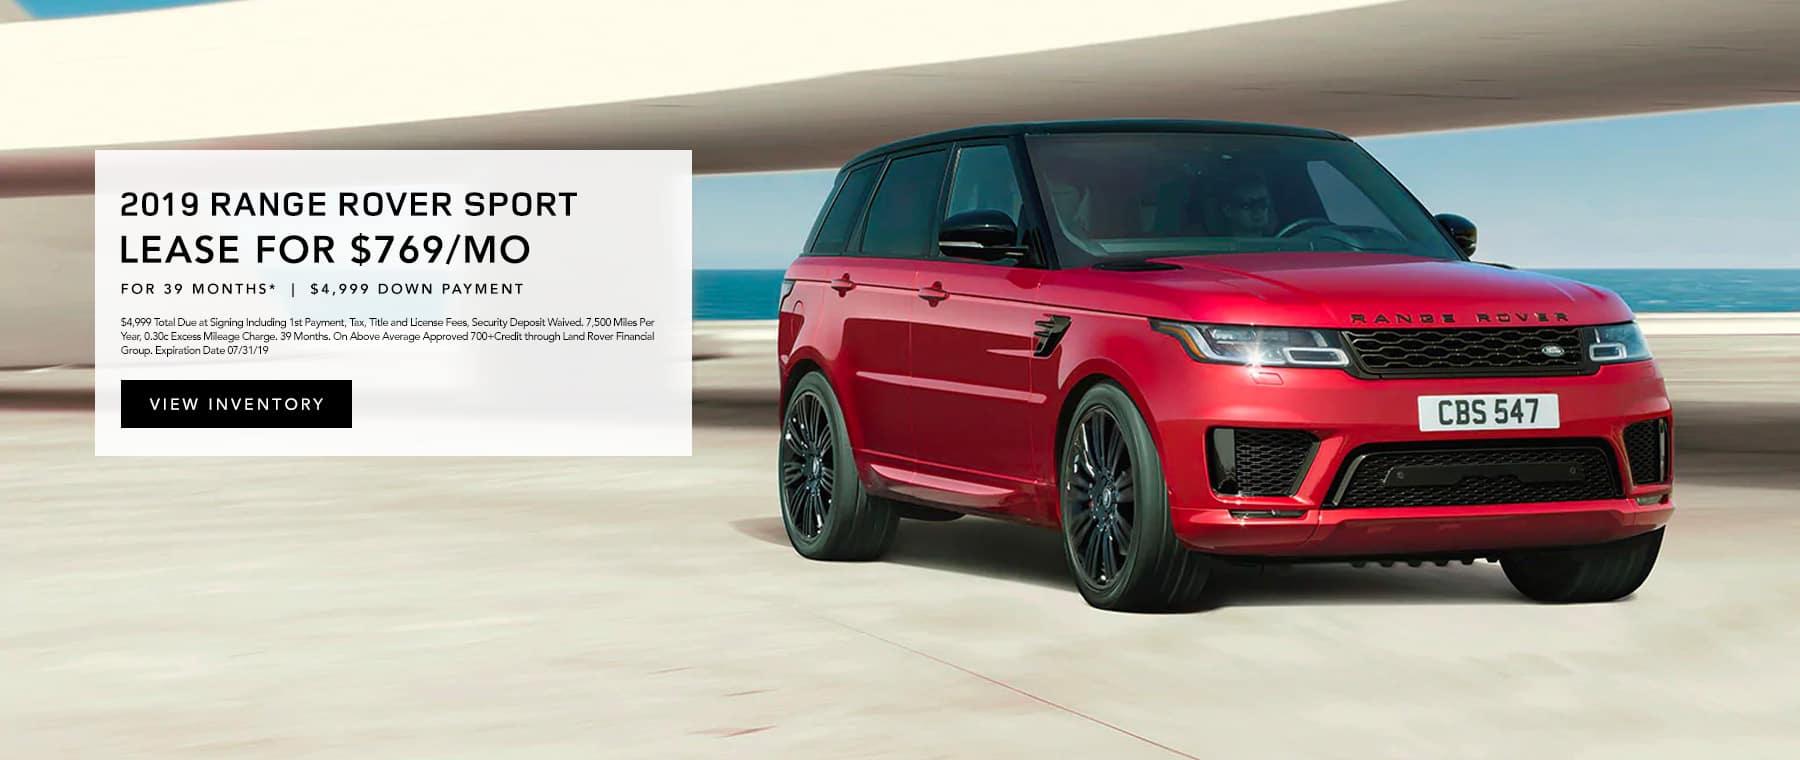 Hornburg Land Rover >> Hornburg Land Rover Best Upcoming Cars Reviews